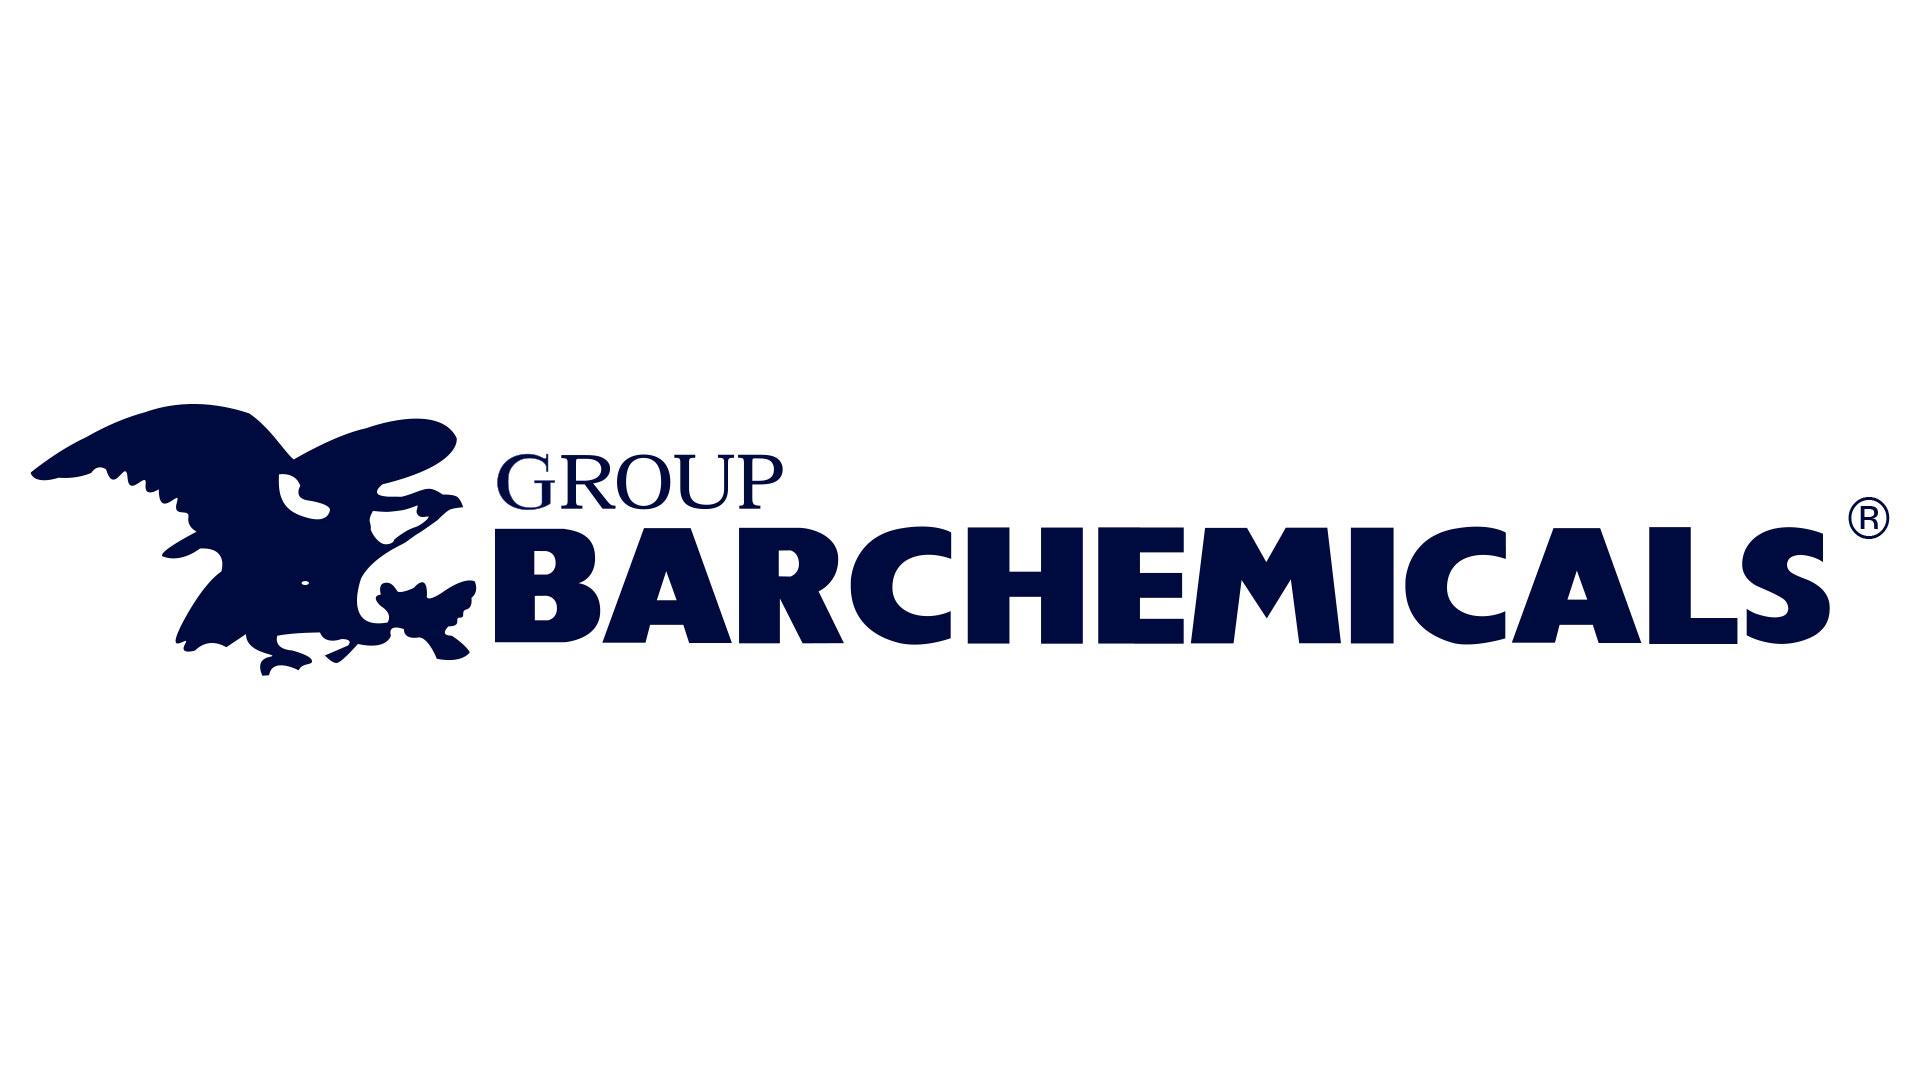 Group-Barchemicals